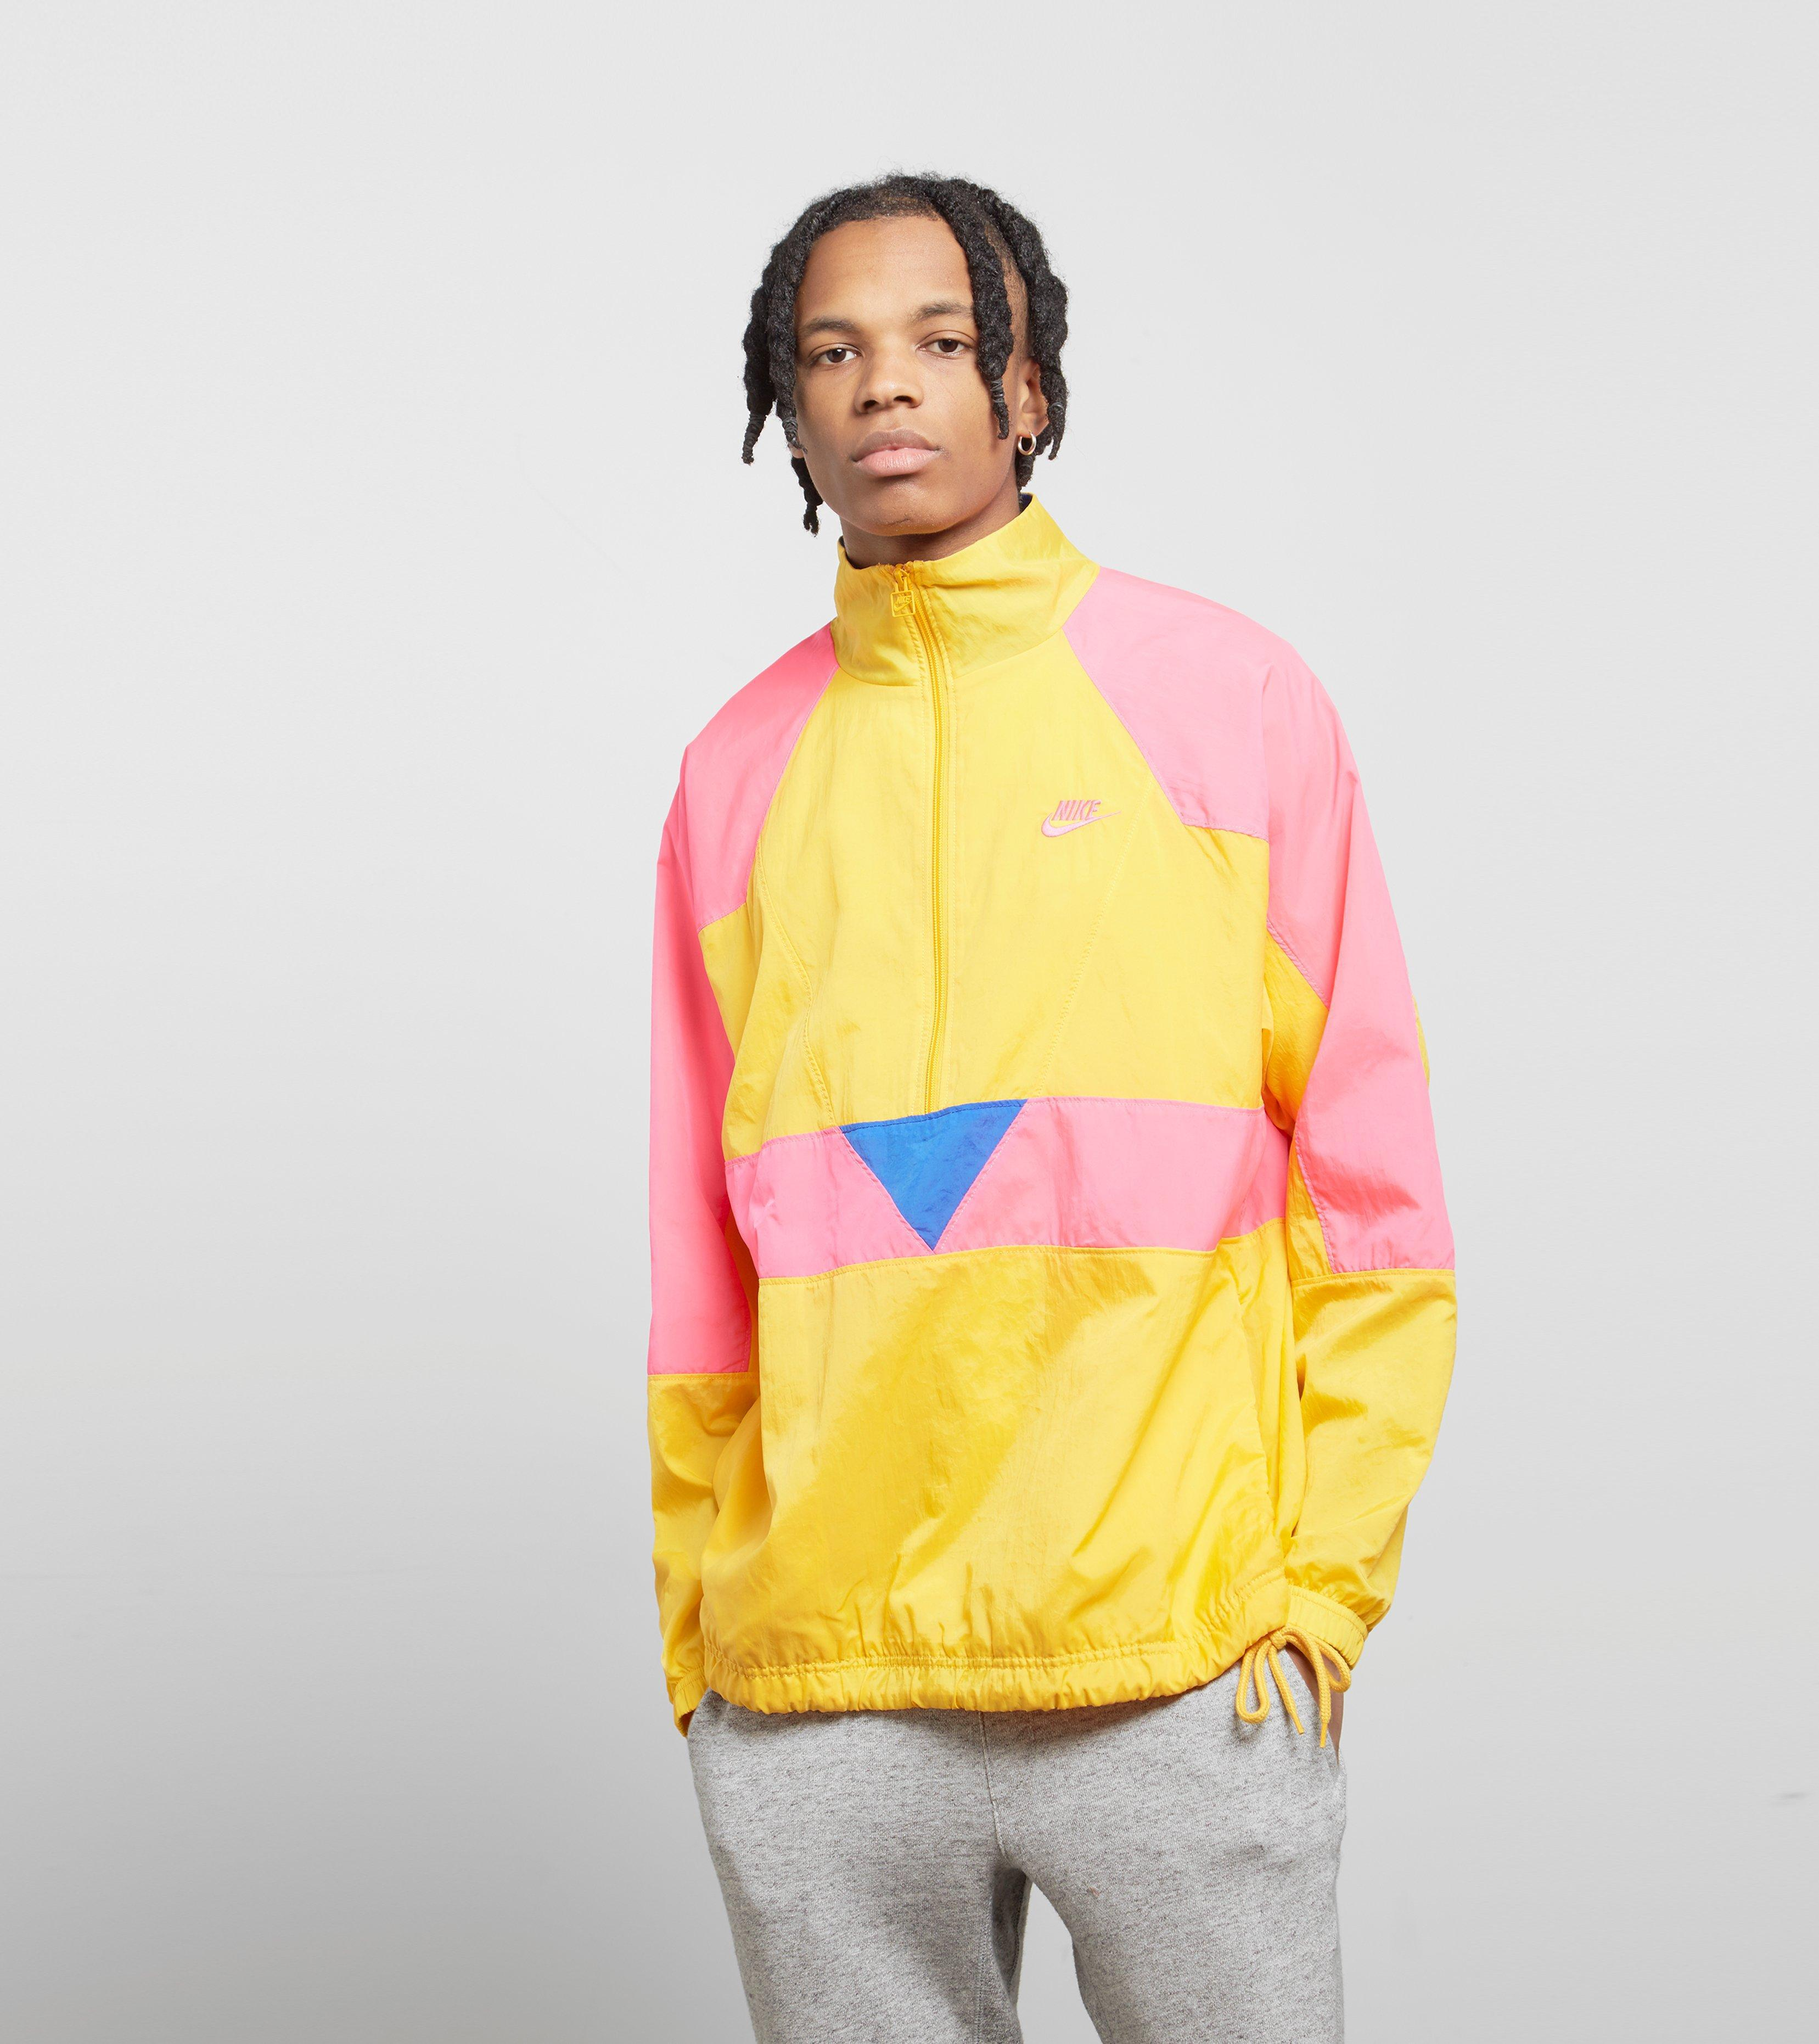 c5b15b690c4b Nike Vaporwave Half Zip Woven Jacket in Yellow for Men - Lyst